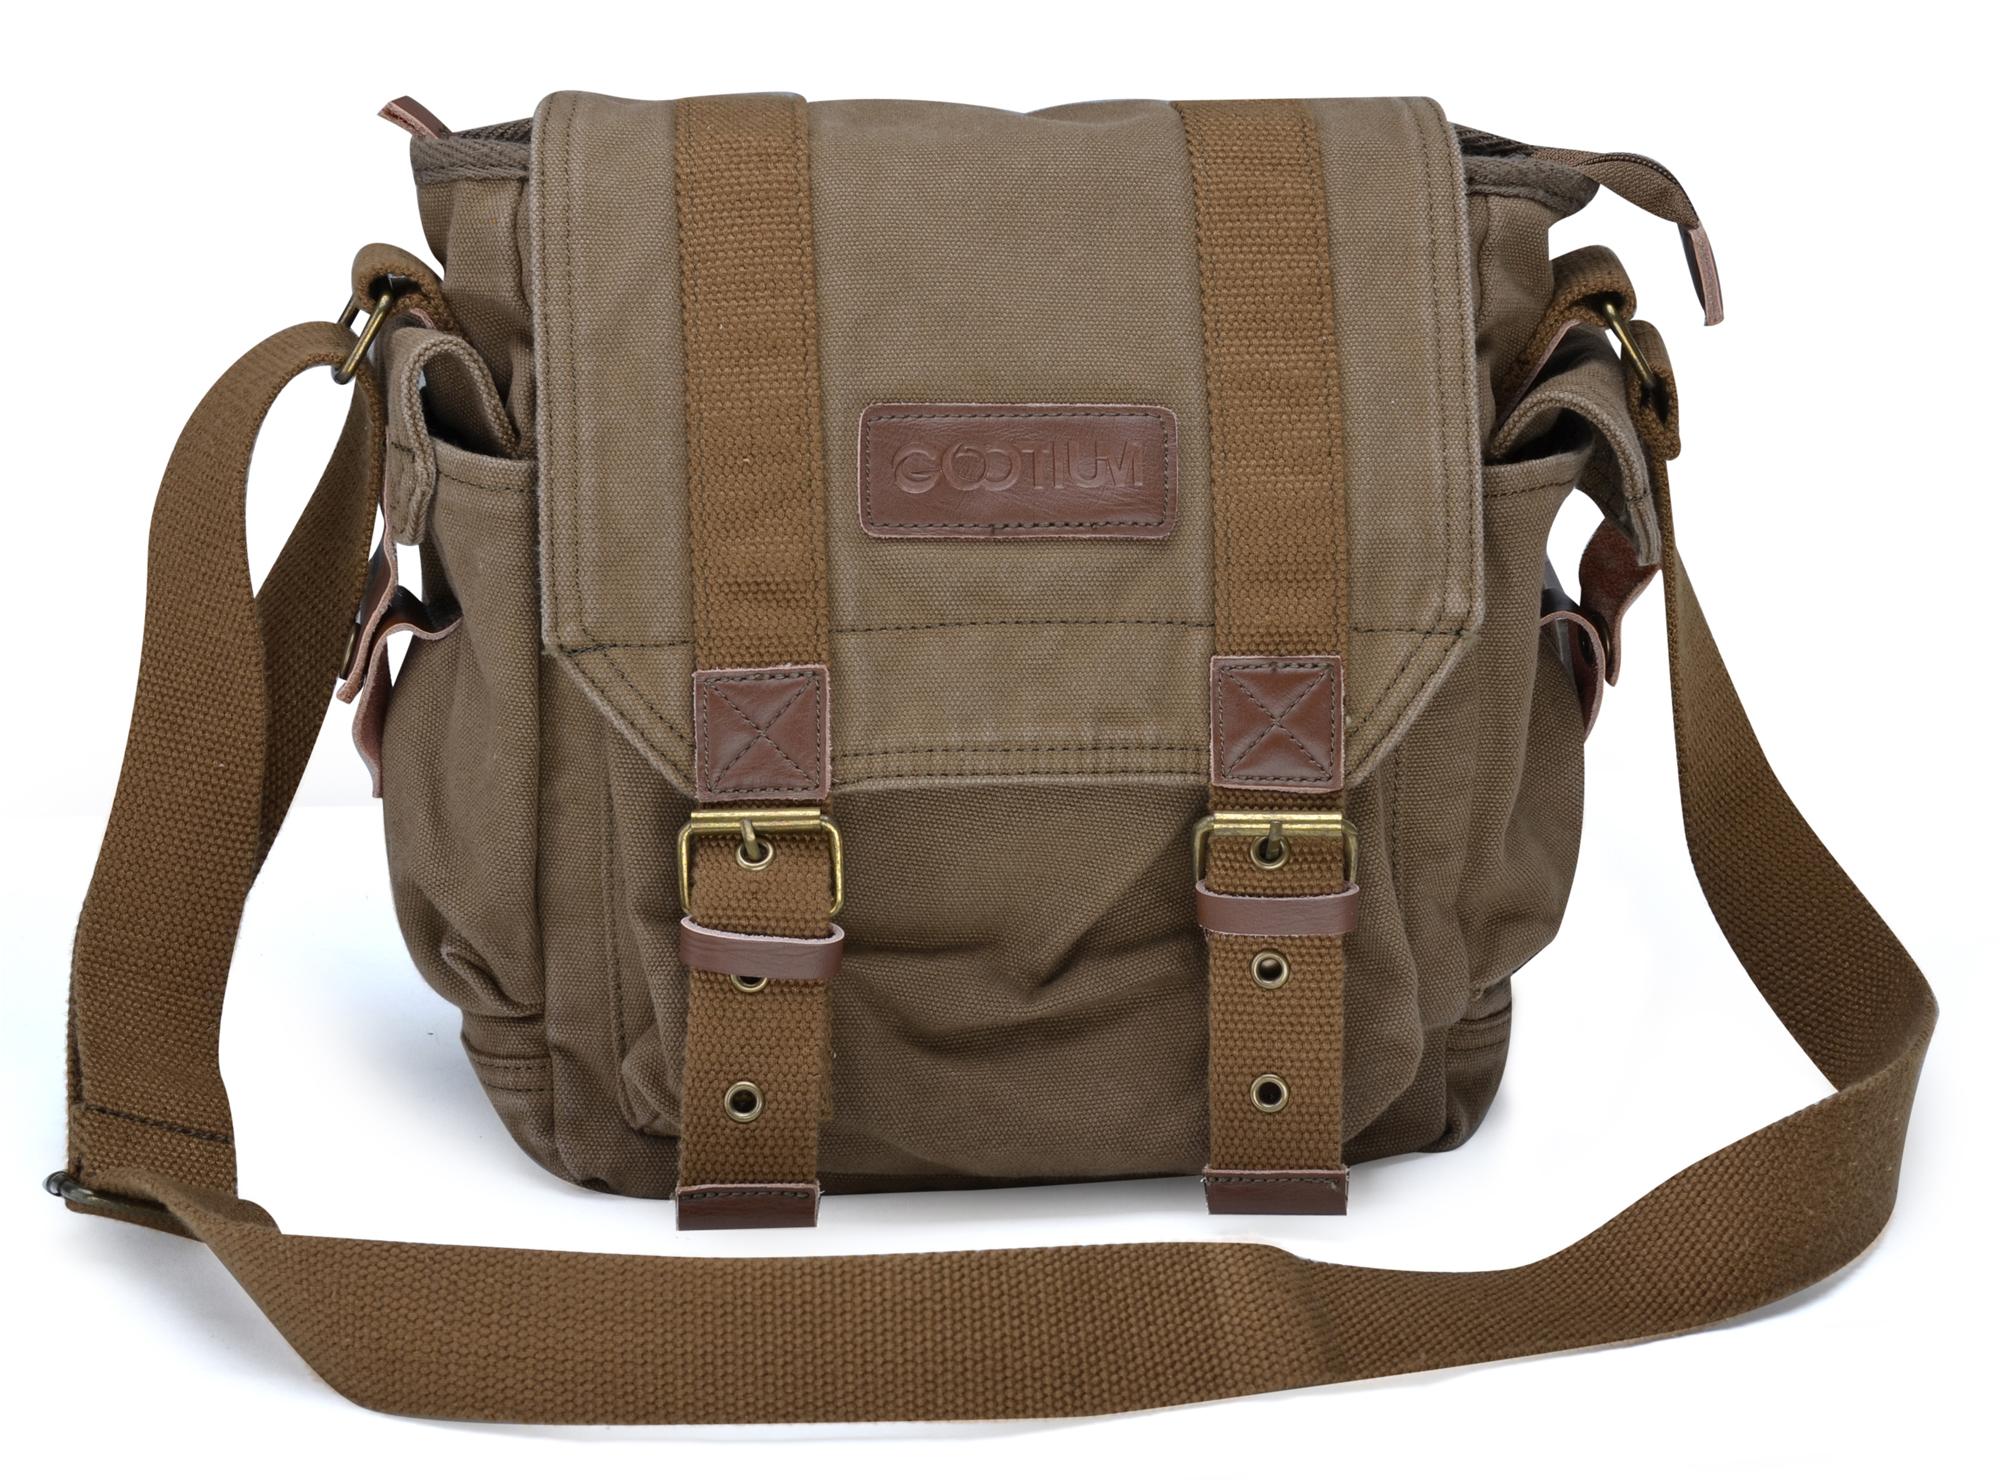 Gootium Vintage Canvas Leather Shoulder Bag Crossbody Messenger ...